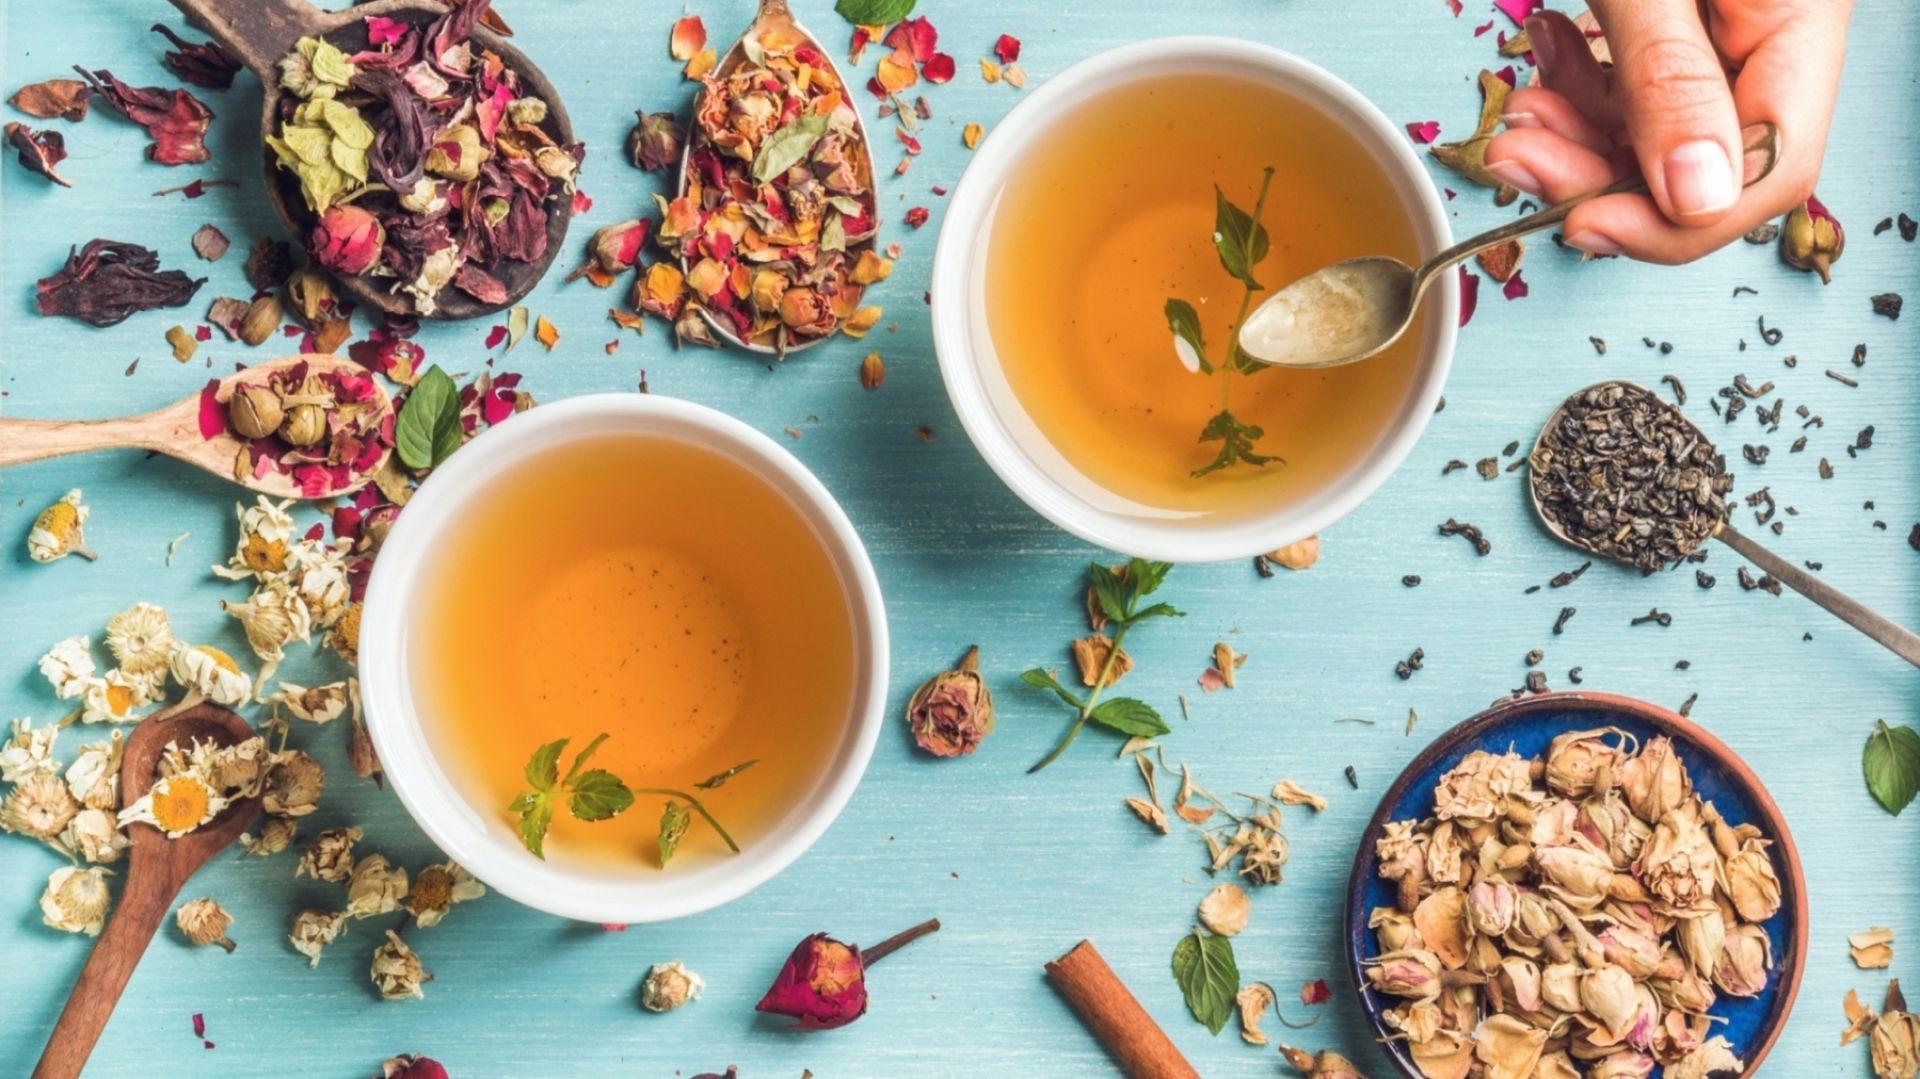 Herbata źródłem pozytywnej energii fot. English Tea Shop Polska